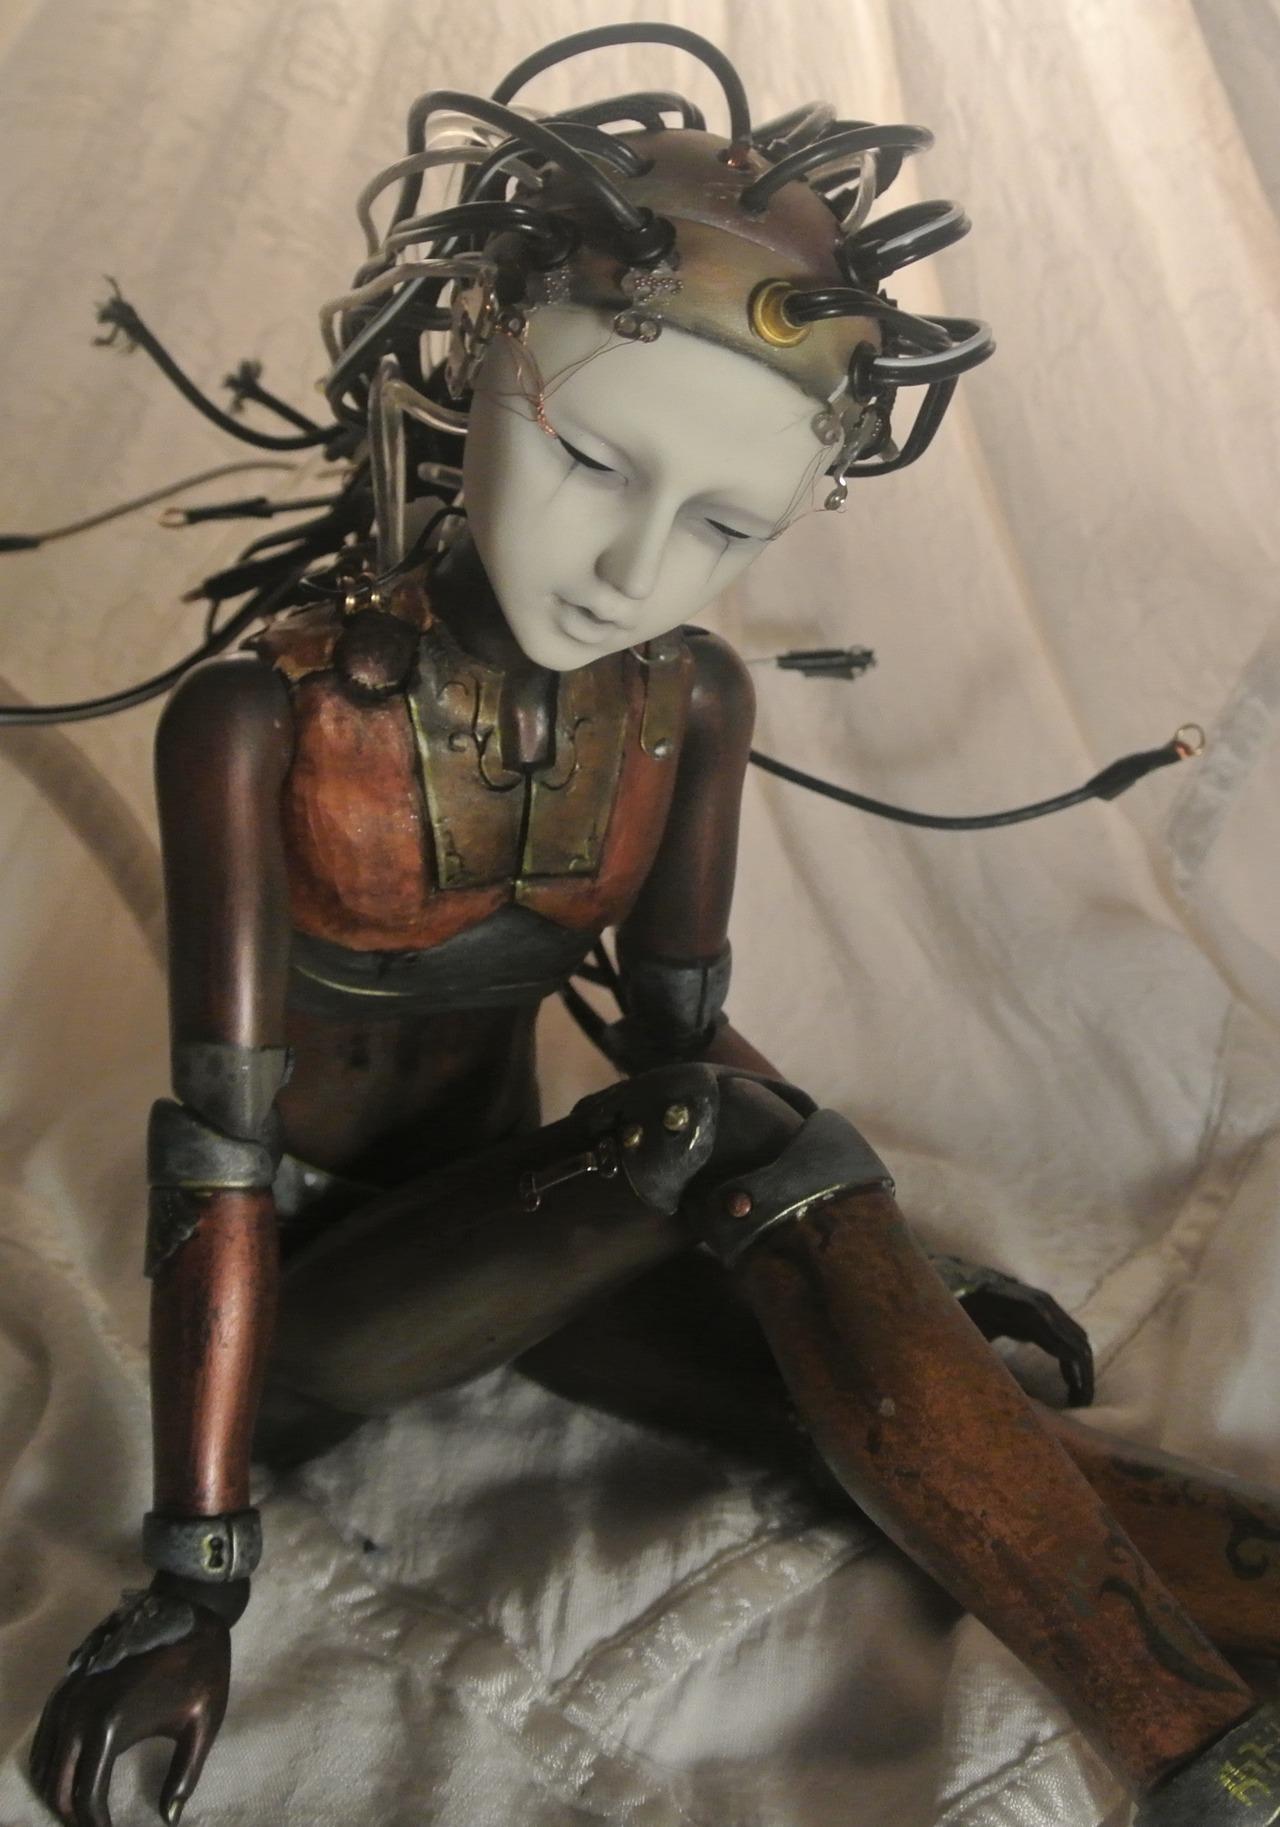 Steampunk Art Dolls de Rackus Ruckus – tumblr